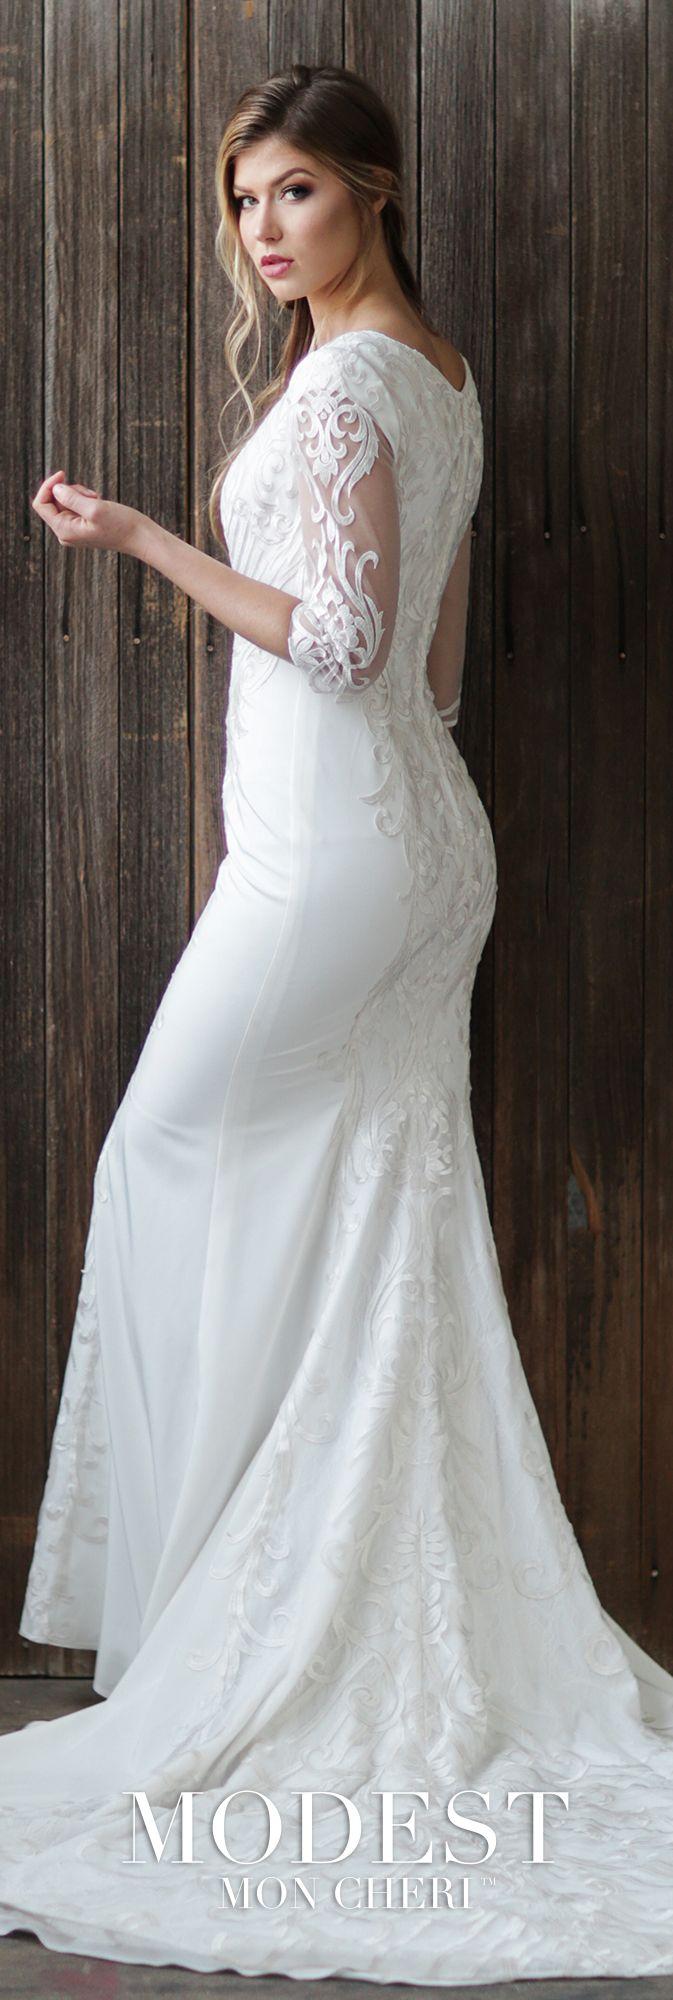 Conservative wedding dresses  Conservative Three Quarter Sleeve Lace Wedding Dress with Illusion